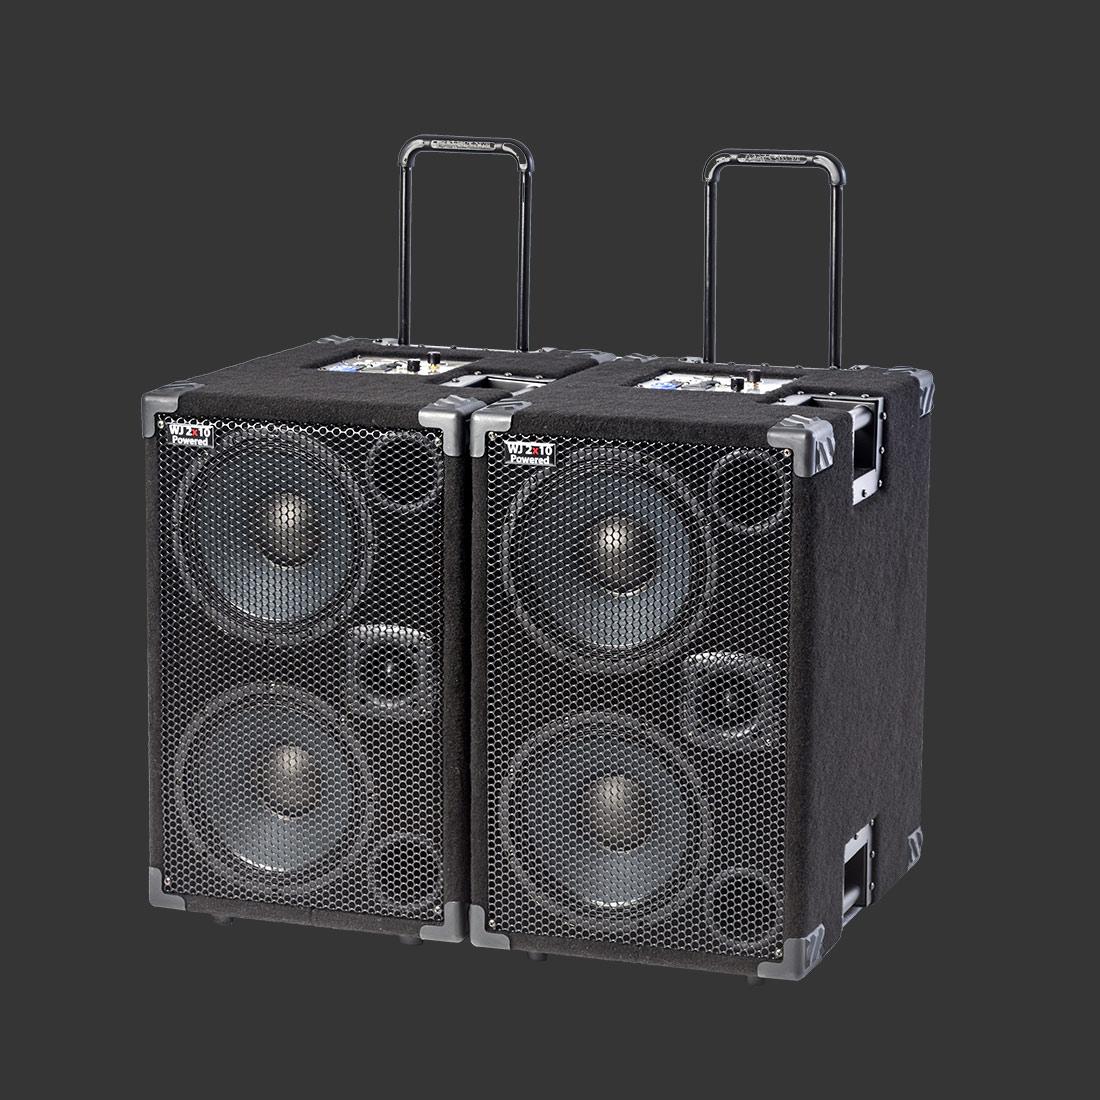 Wayne Jones AUDIO - Hi Powered, Hi End Bass Speaker Cabinets